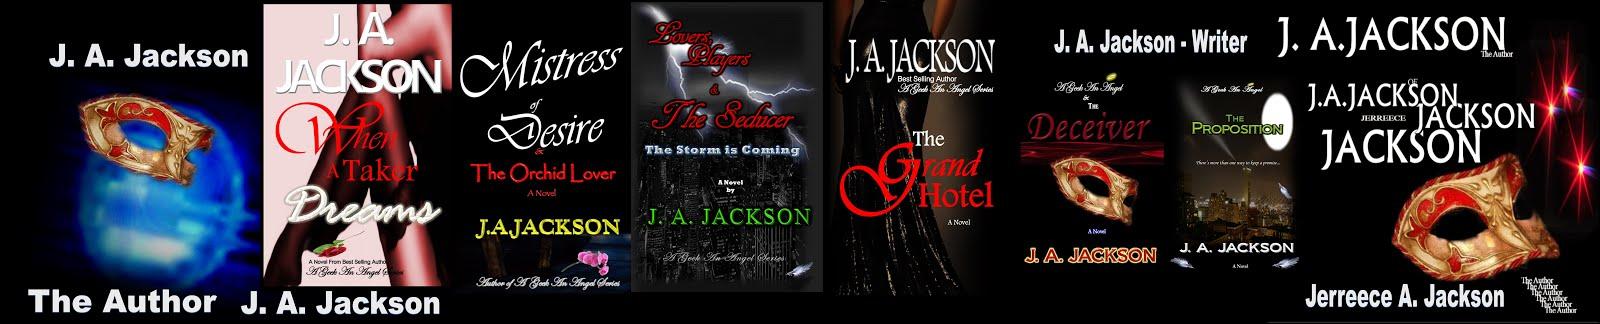 Jajackson Lovers Players The Seducer Chapter 1enjoy